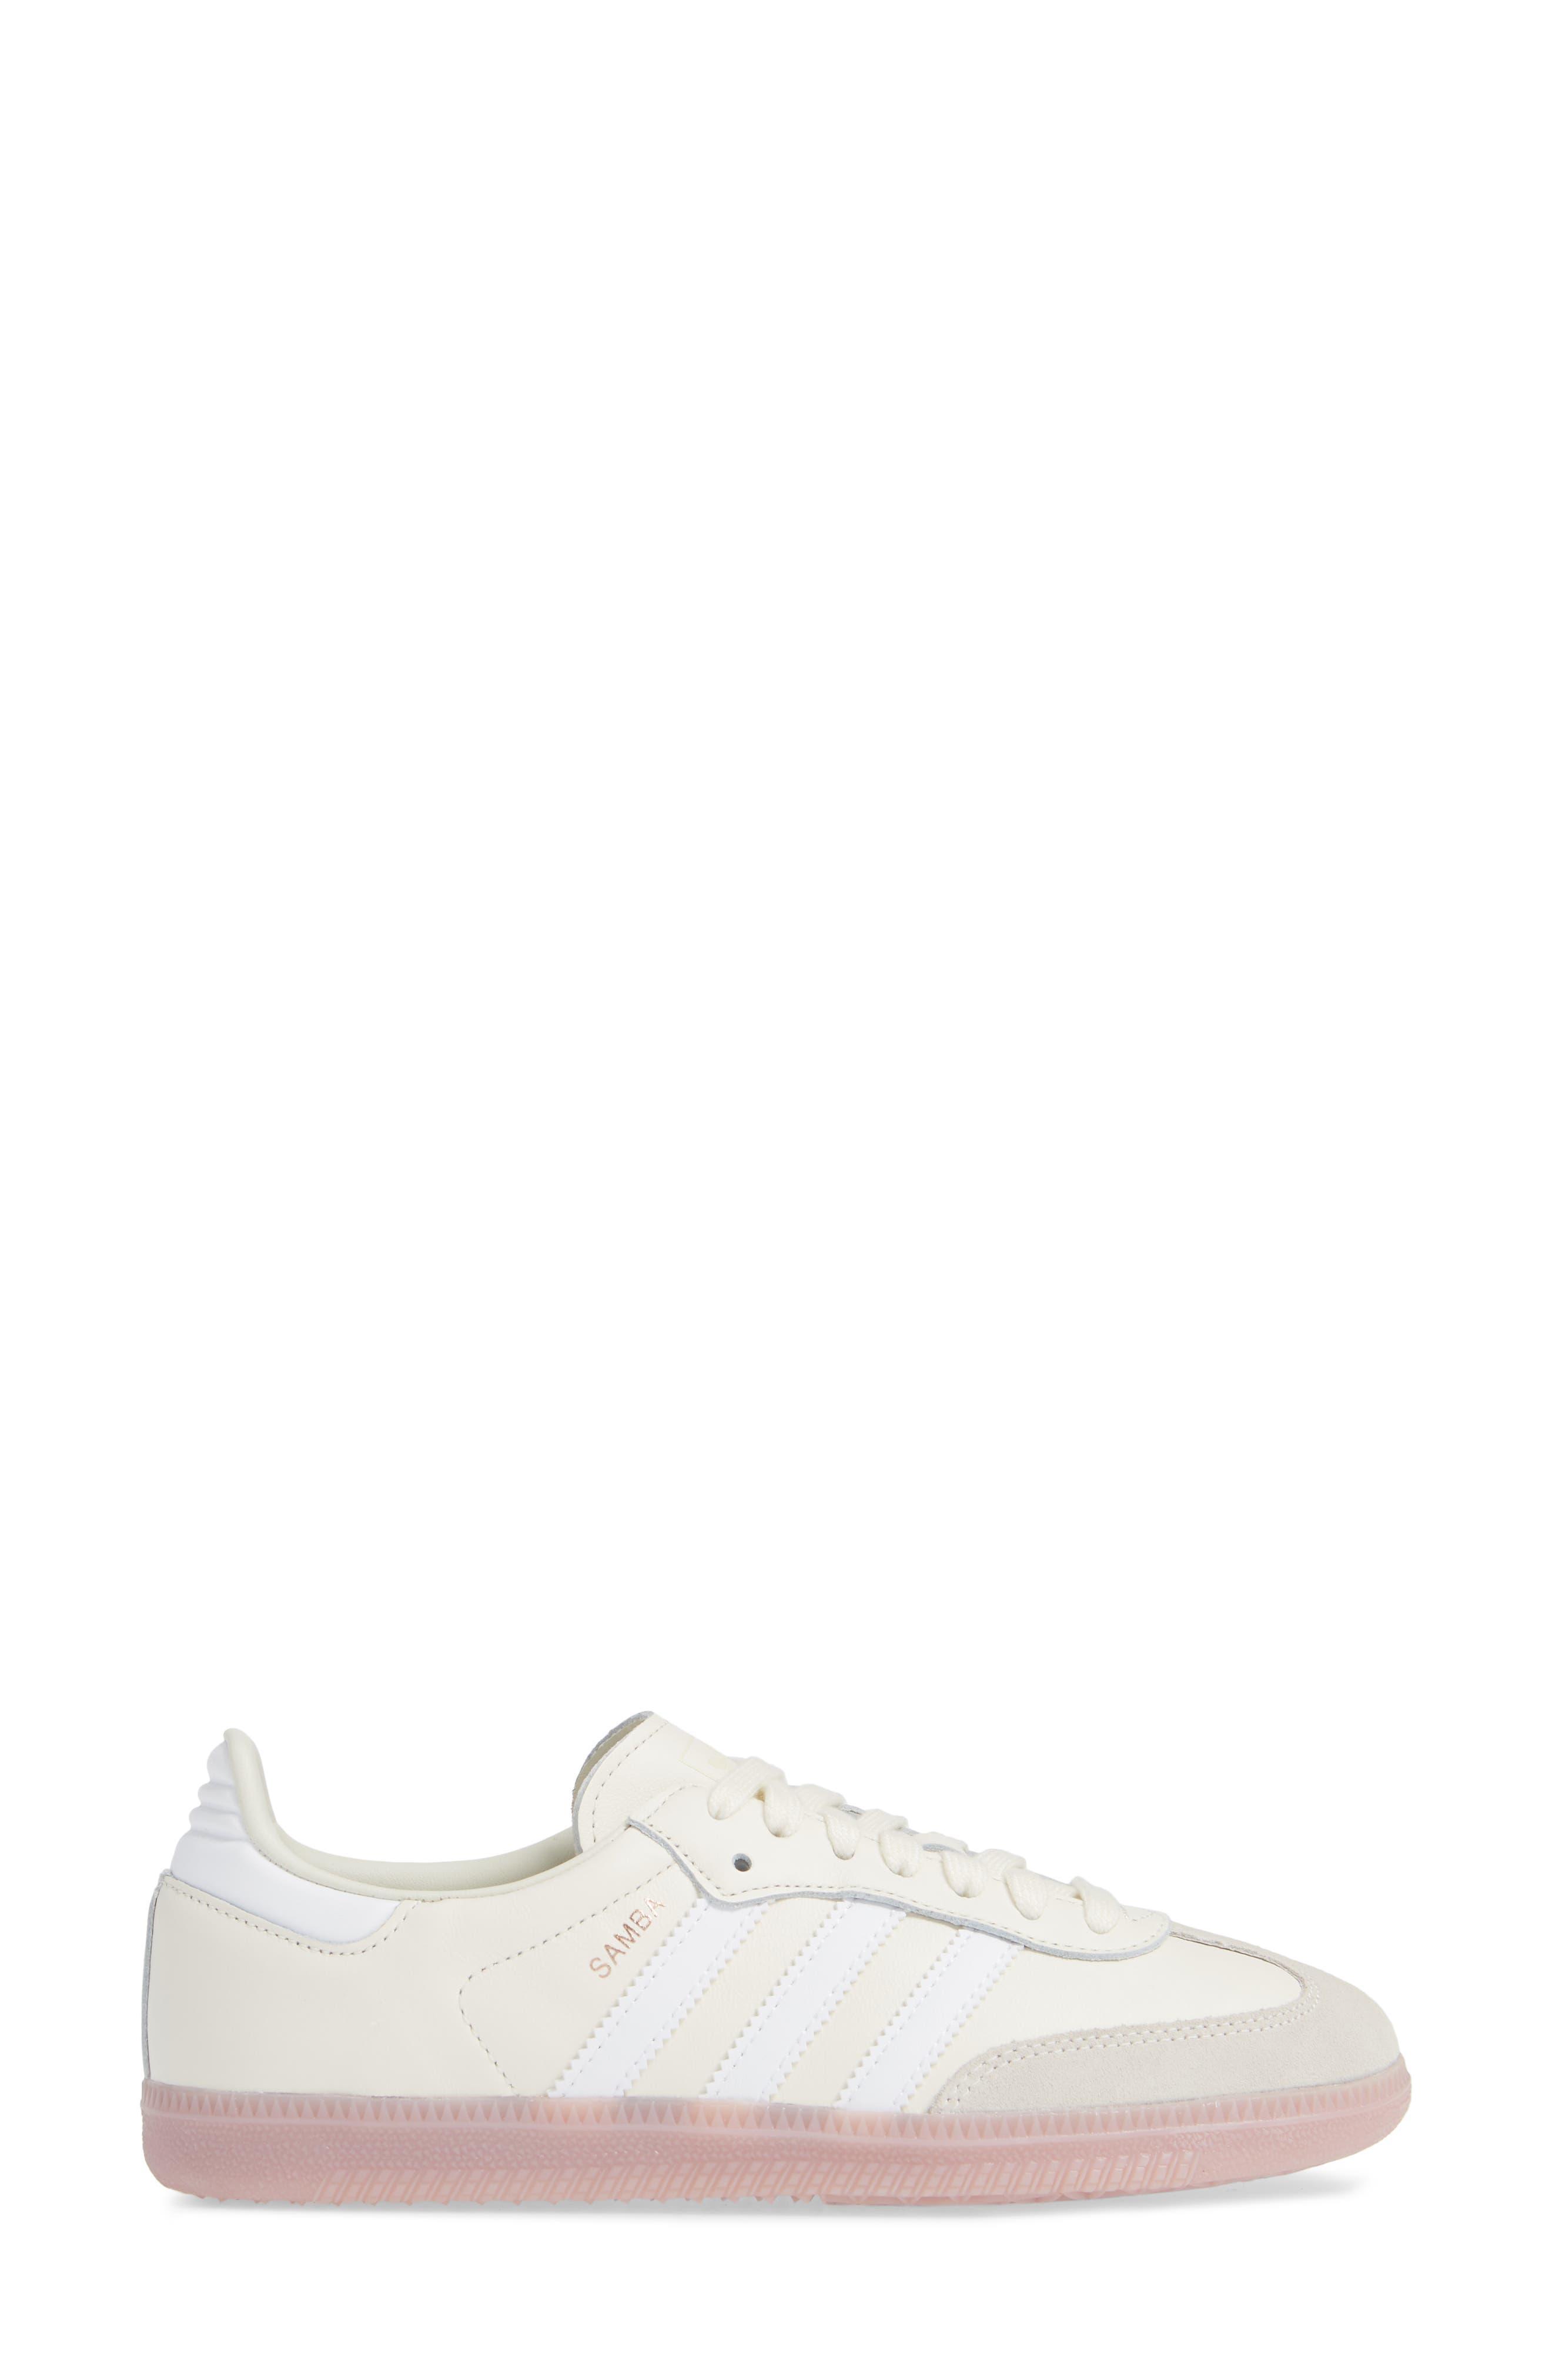 Samba Sneaker,                             Alternate thumbnail 3, color,                             OFF WHITE/ WHITE/ SOFT VISION